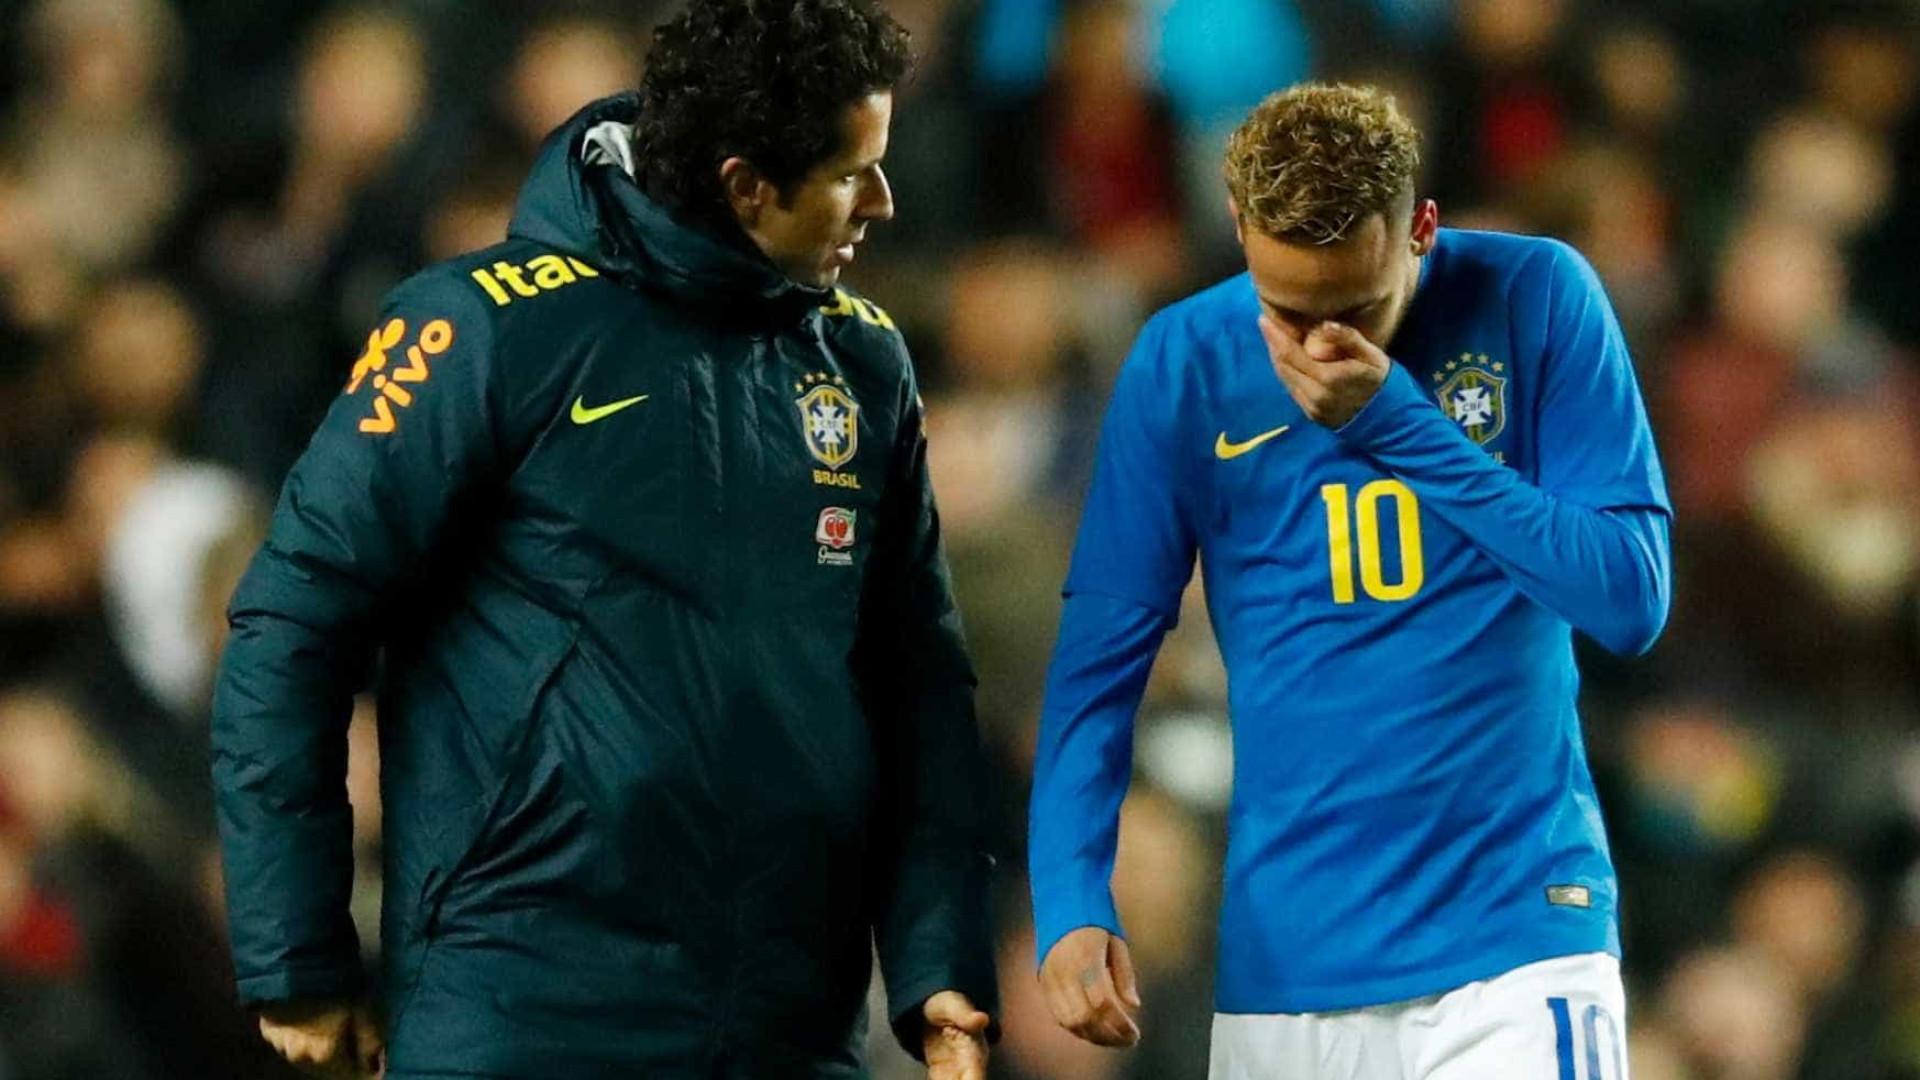 Neymar se lesiona e deixa amistoso aos 7 minutos do 1º tempo